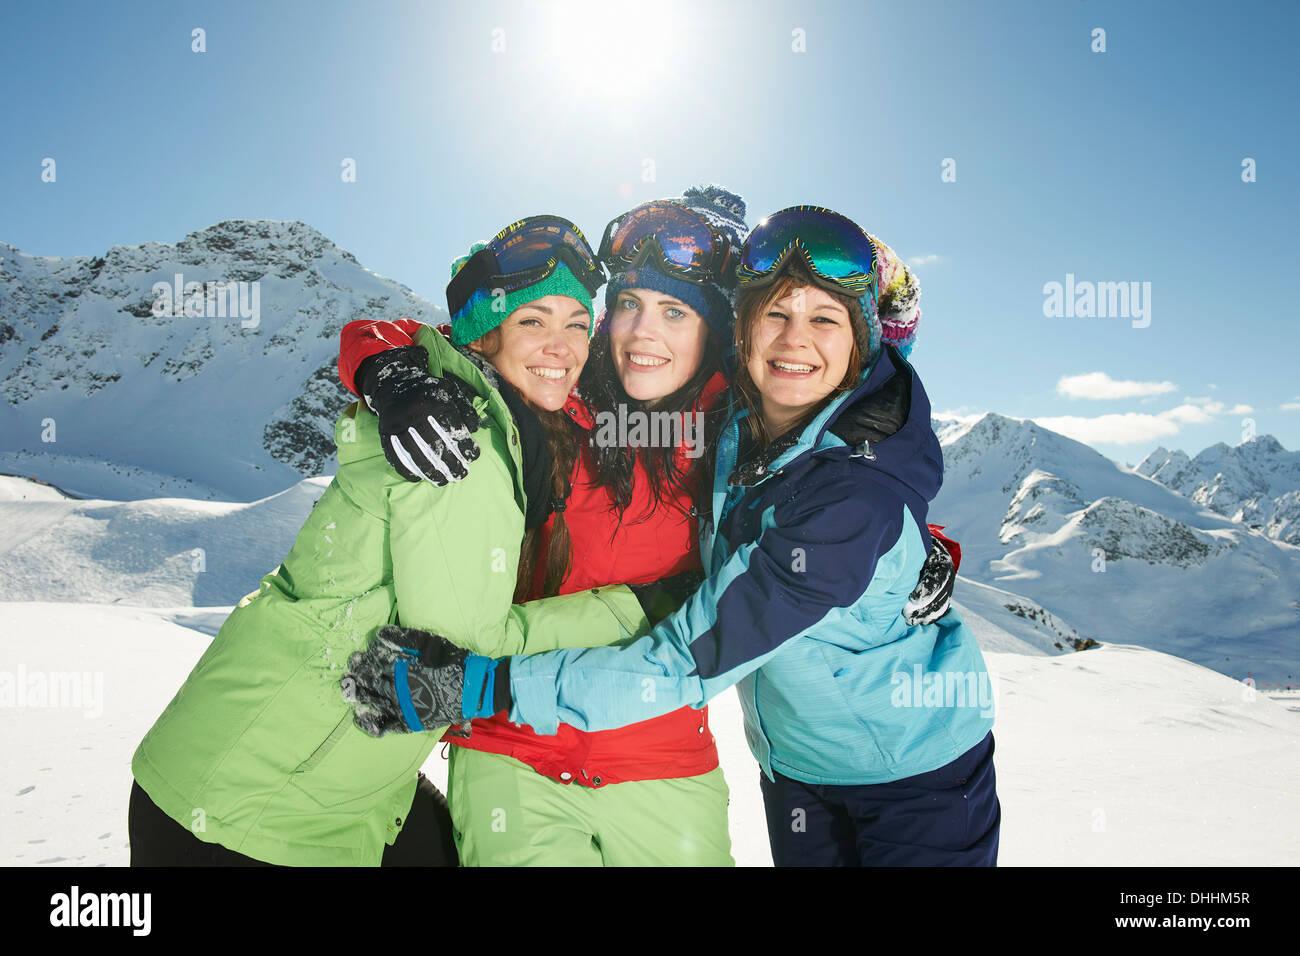 Amigas vistiendo skiwear, Kuhtai, Austria Imagen De Stock